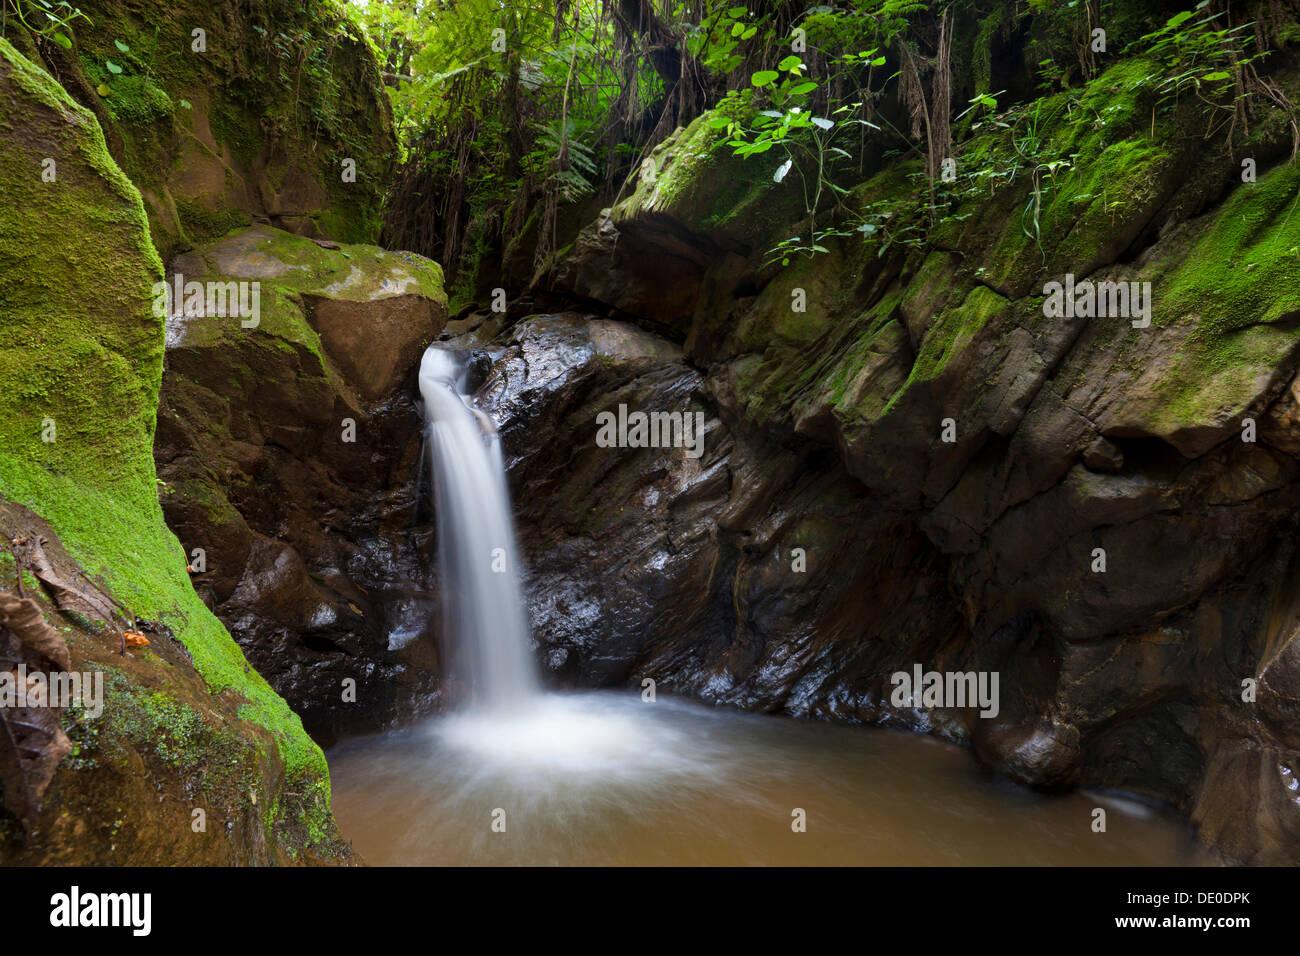 Waterfall at the foot of the Virunga Volcanoes - Stock Image